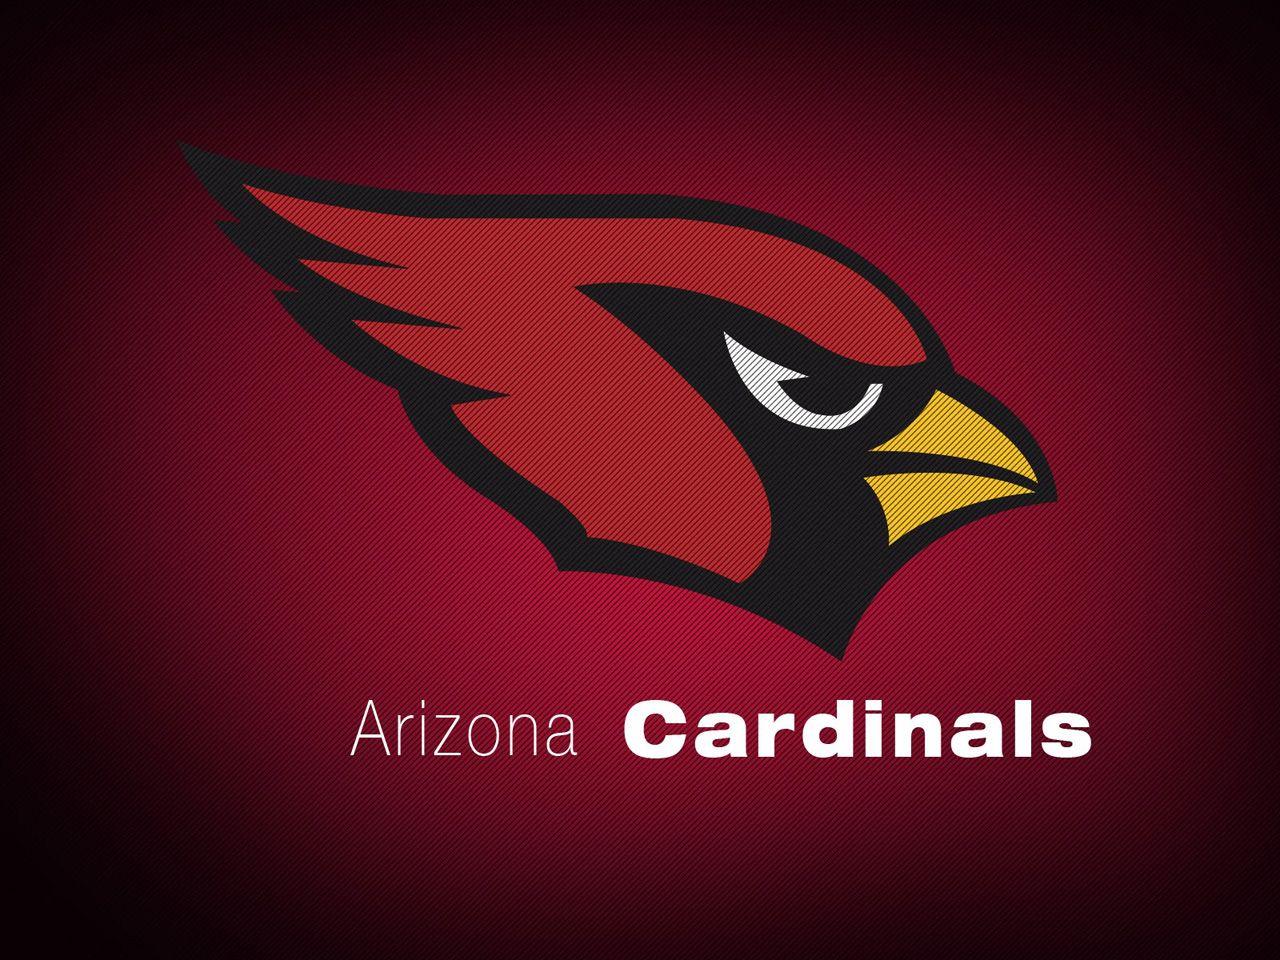 Arizona Cardinals Logo 2 Wallpaper, Download Free Arizona